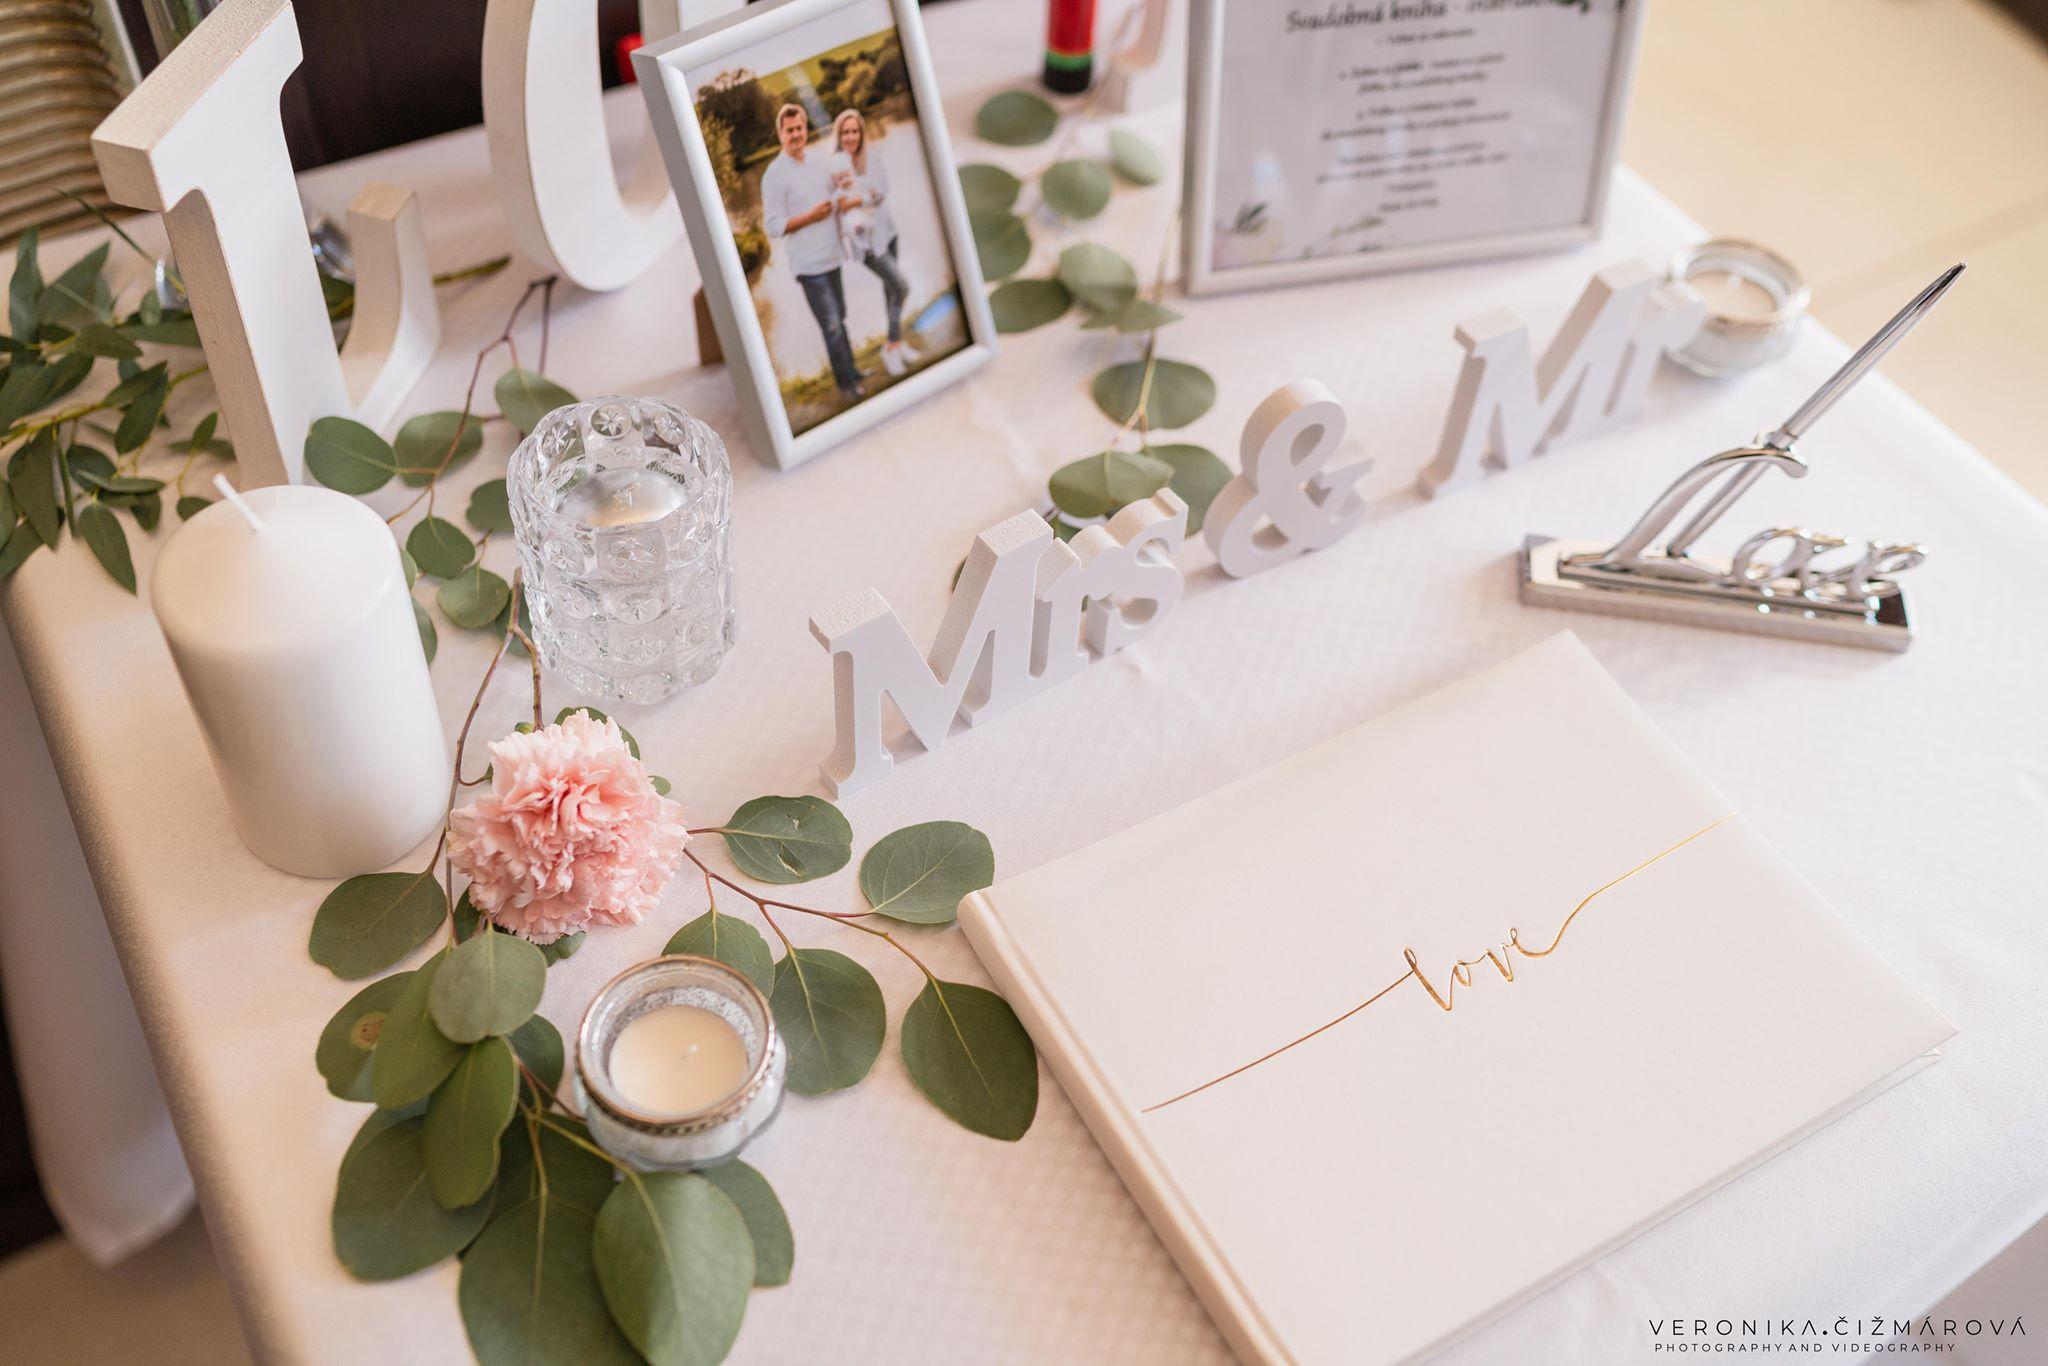 fotokutik-na-svadbu-fotograf-svadba-svadobny-fotografjpg